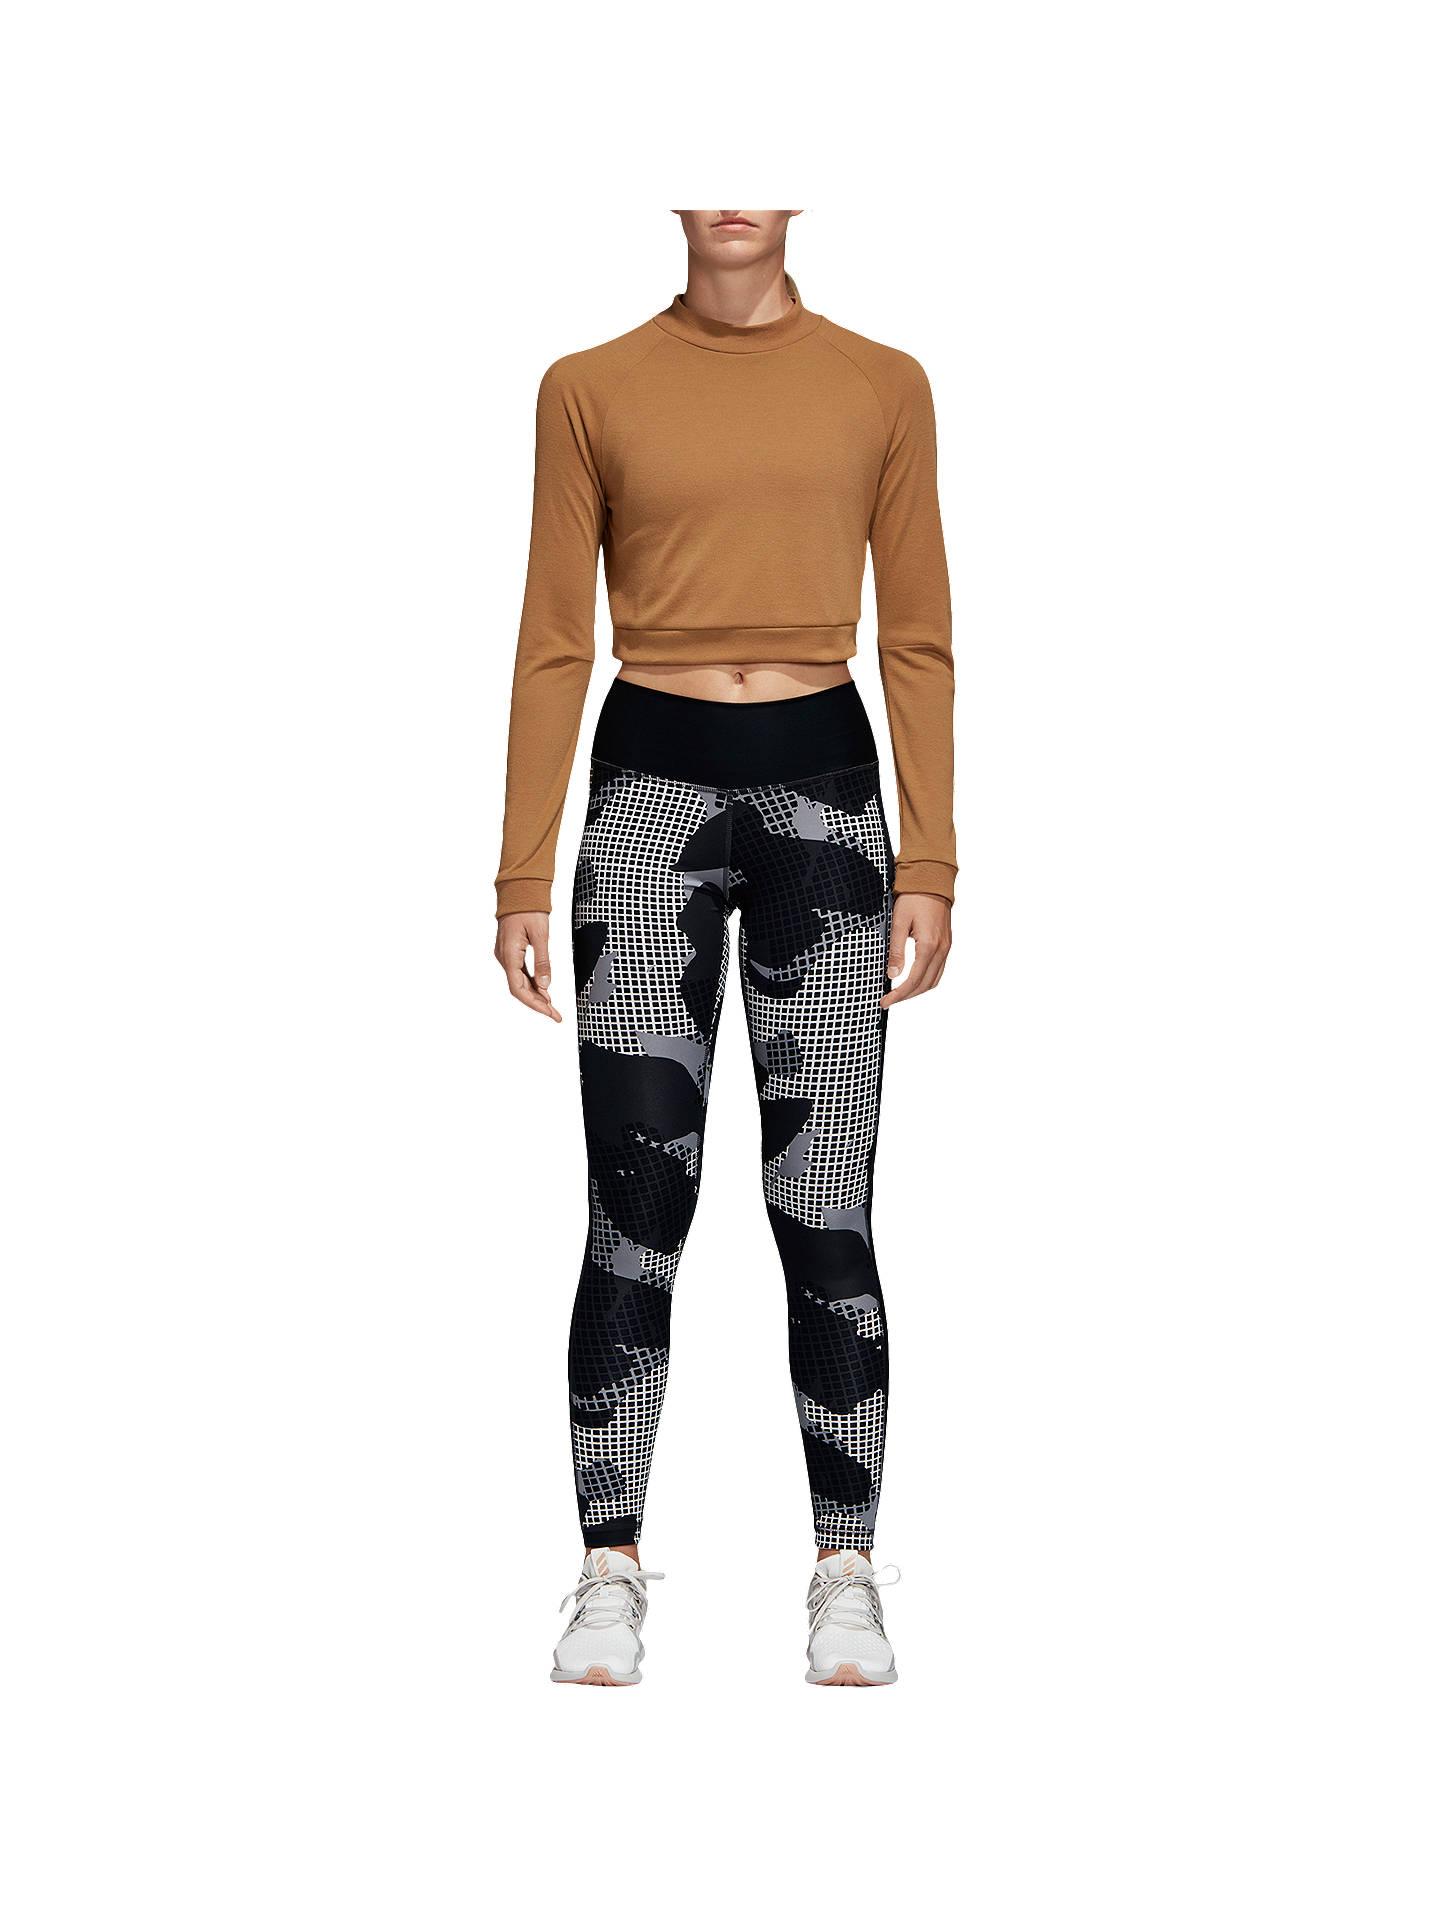 5ffc6fab334664 Buy adidas Climalite Printed Training Tights, Black/Print, XS Online at  johnlewis.